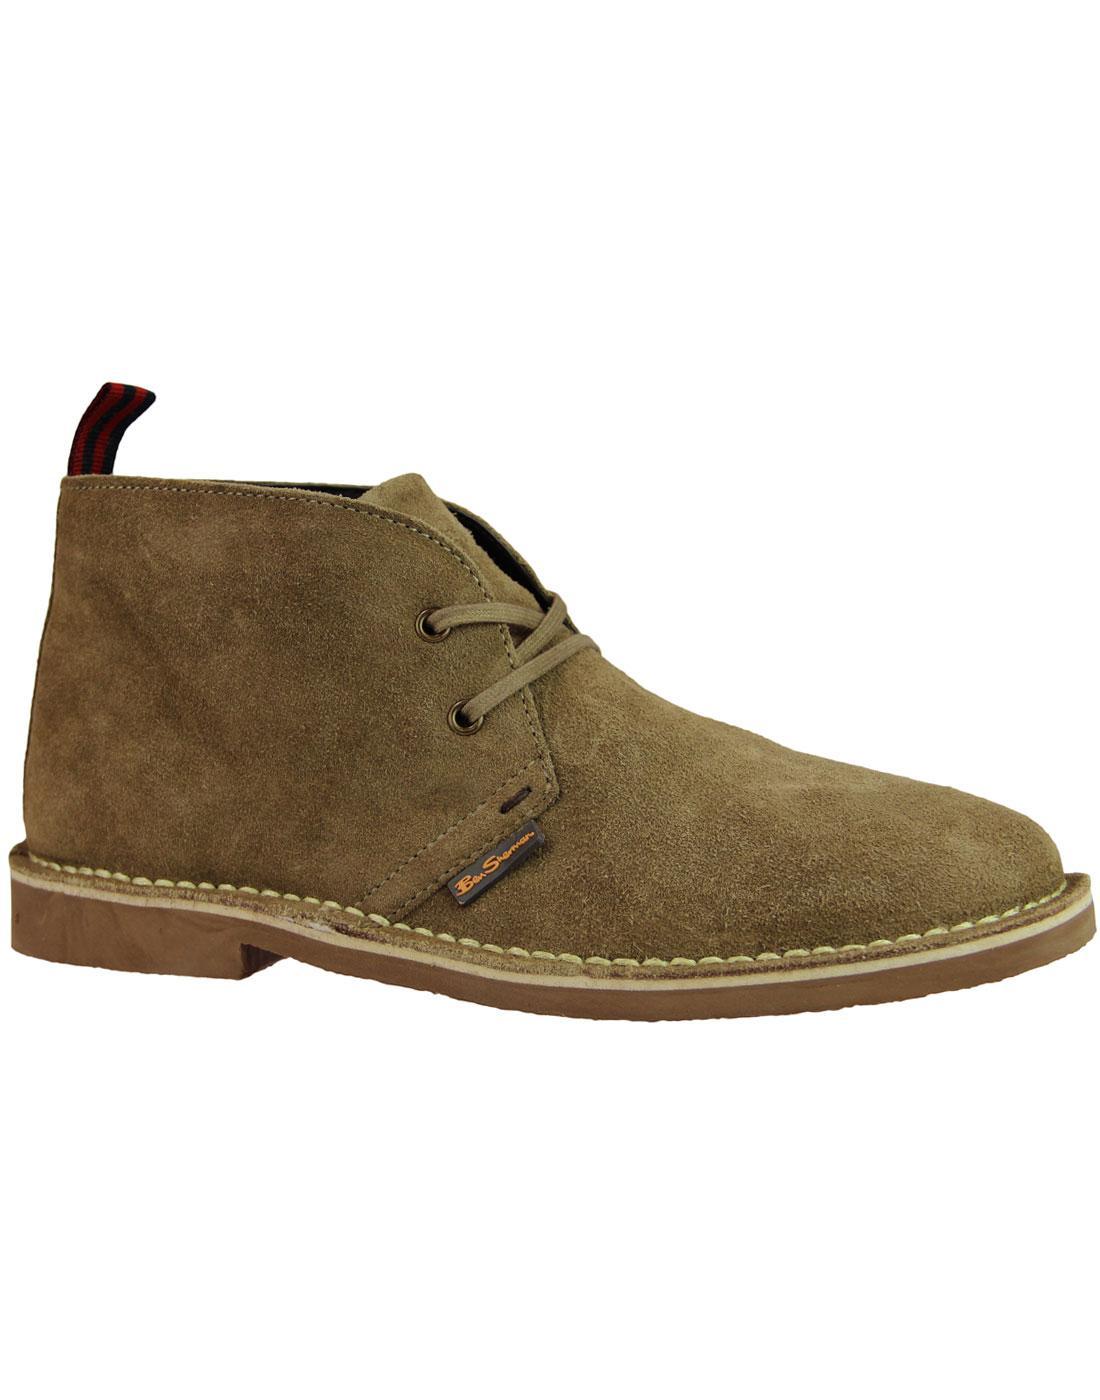 Hunt BEN SHERMAN Retro Mod Suede Desert Boots SAND